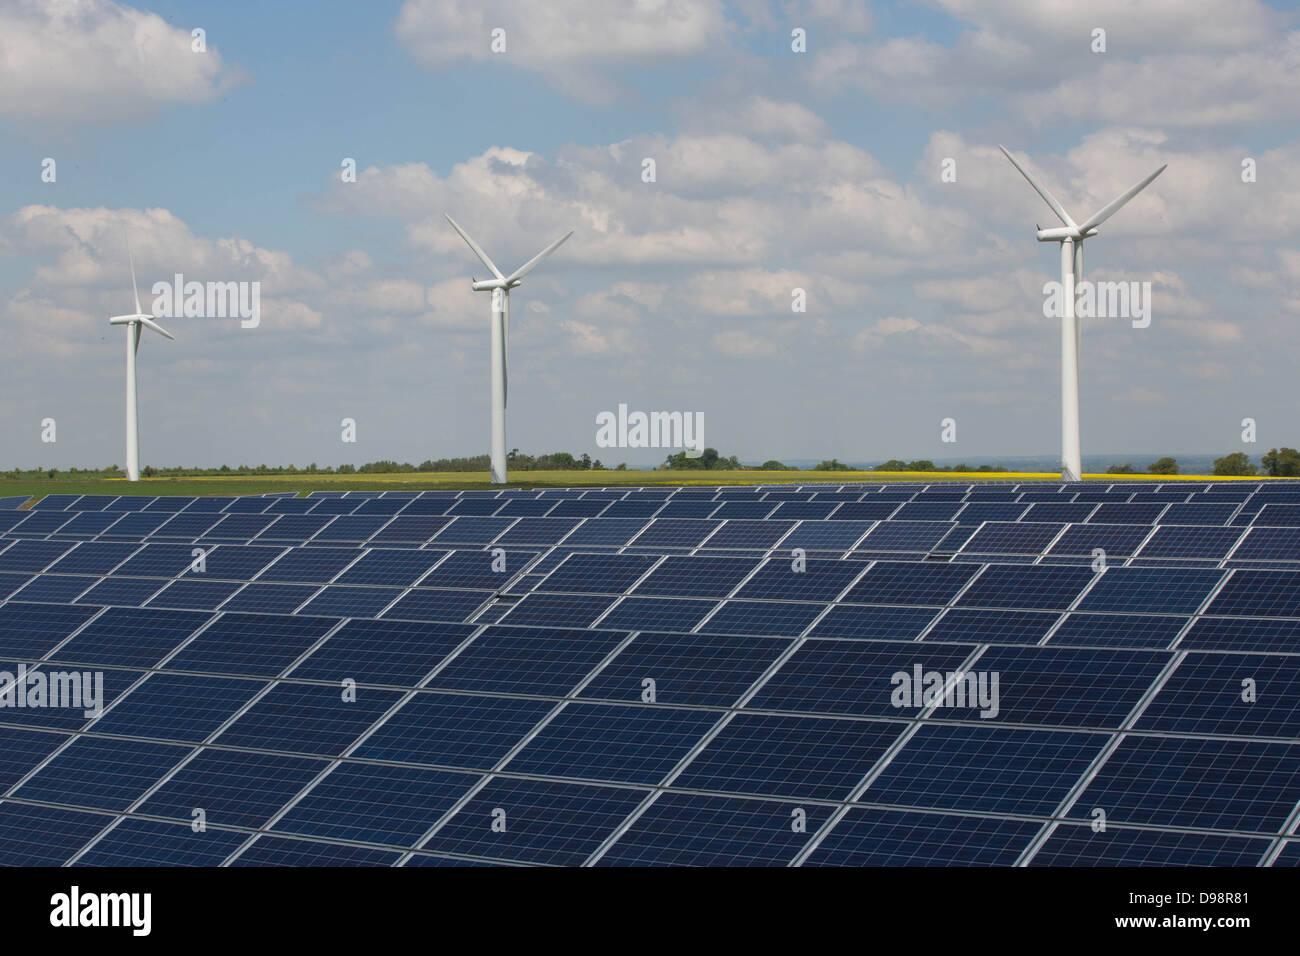 Solar panels and wind turbines on an energy farm - Stock Image